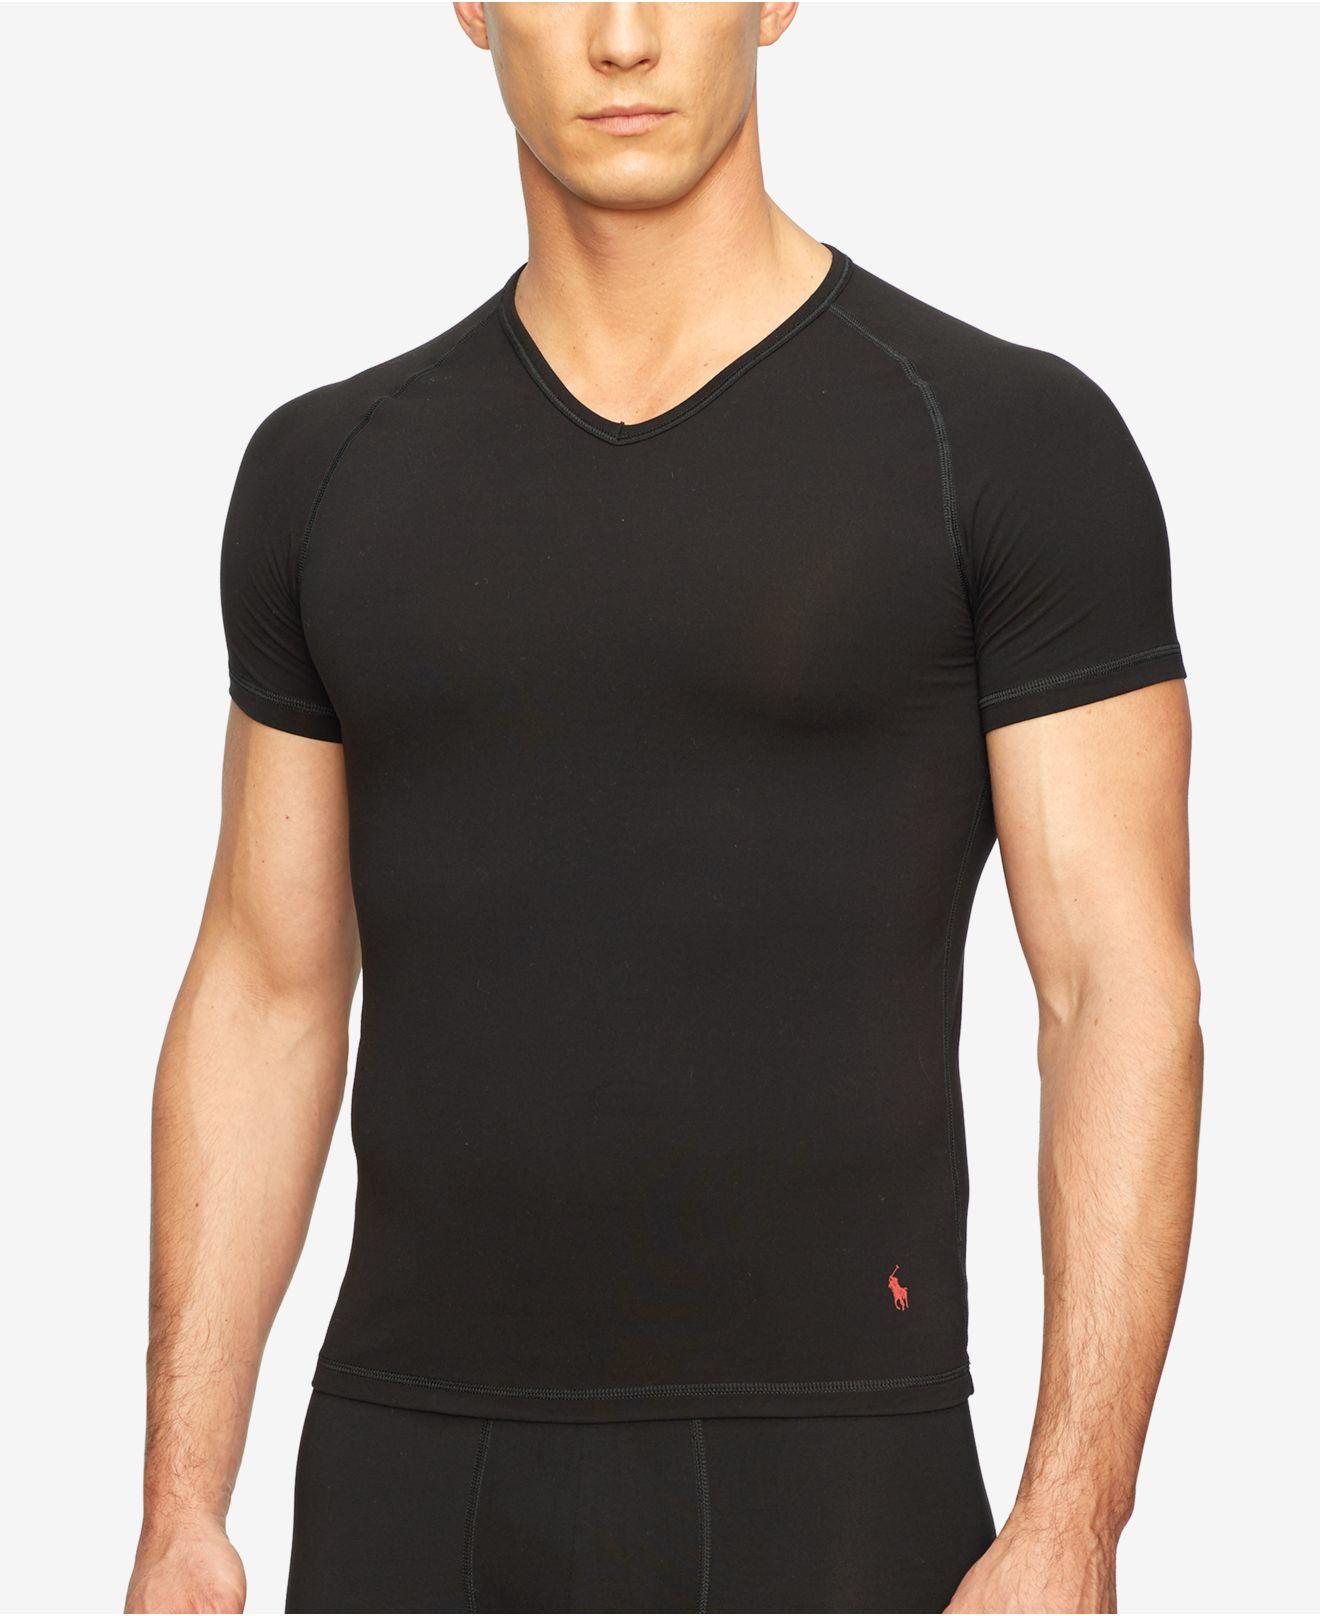 Polo Ralph Lauren Men 39 S Microfiber Undershirt In Black For